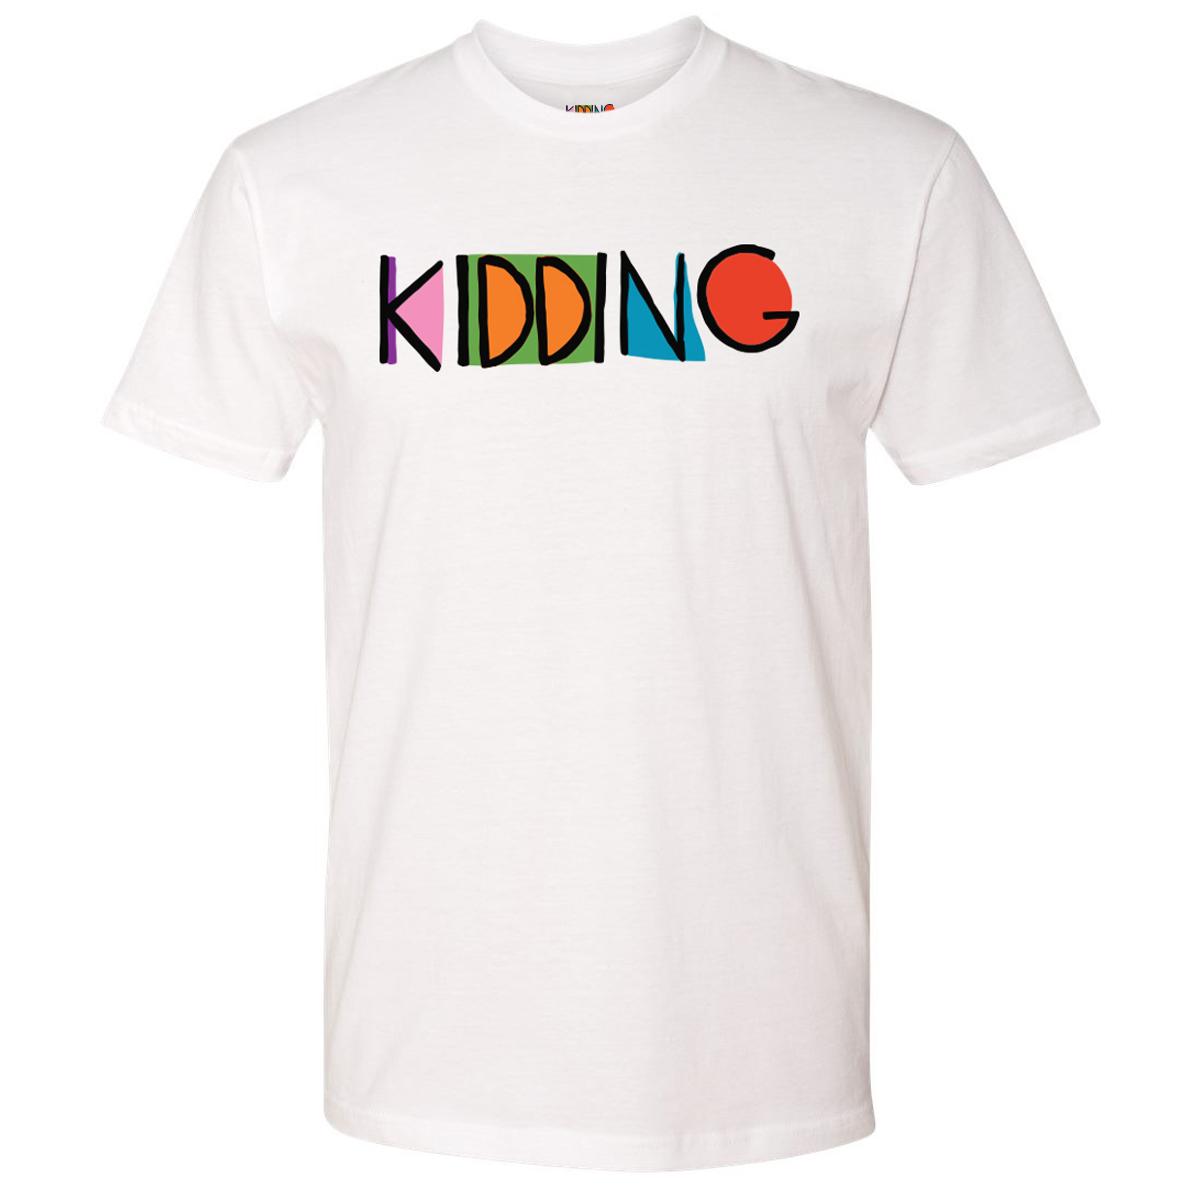 Kidding Logo T-Shirt